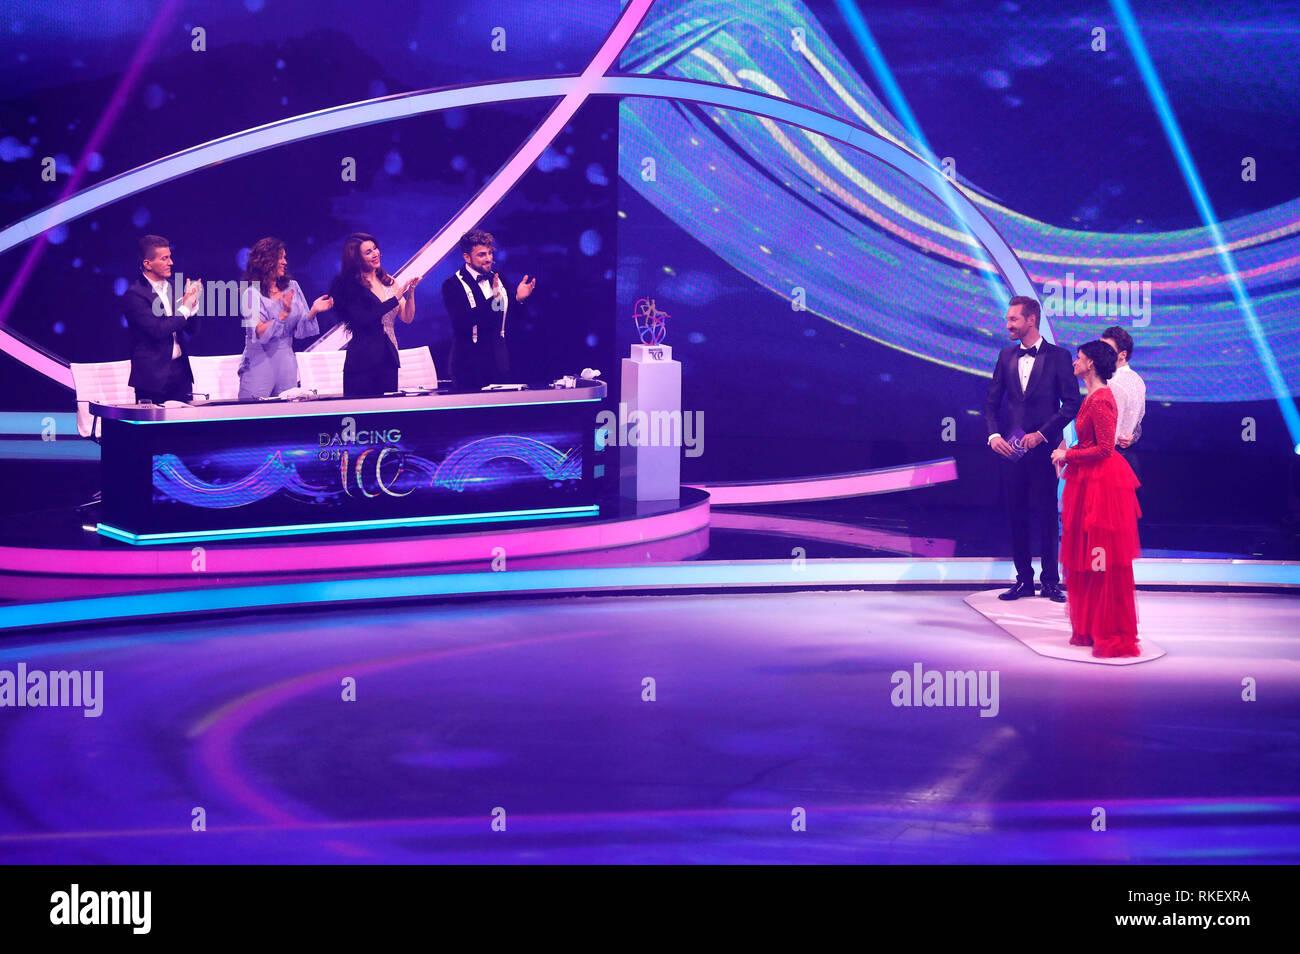 "Daniel Weiss, Katarina Witt, Judith Williams, Cale Kalay, Daniel Boschmann und Marlene Lufen im Finale der Sat.1-Show ""dancing on Ice"" in den MMC-Studios. Köln, 10.02.2019 Stockbild"